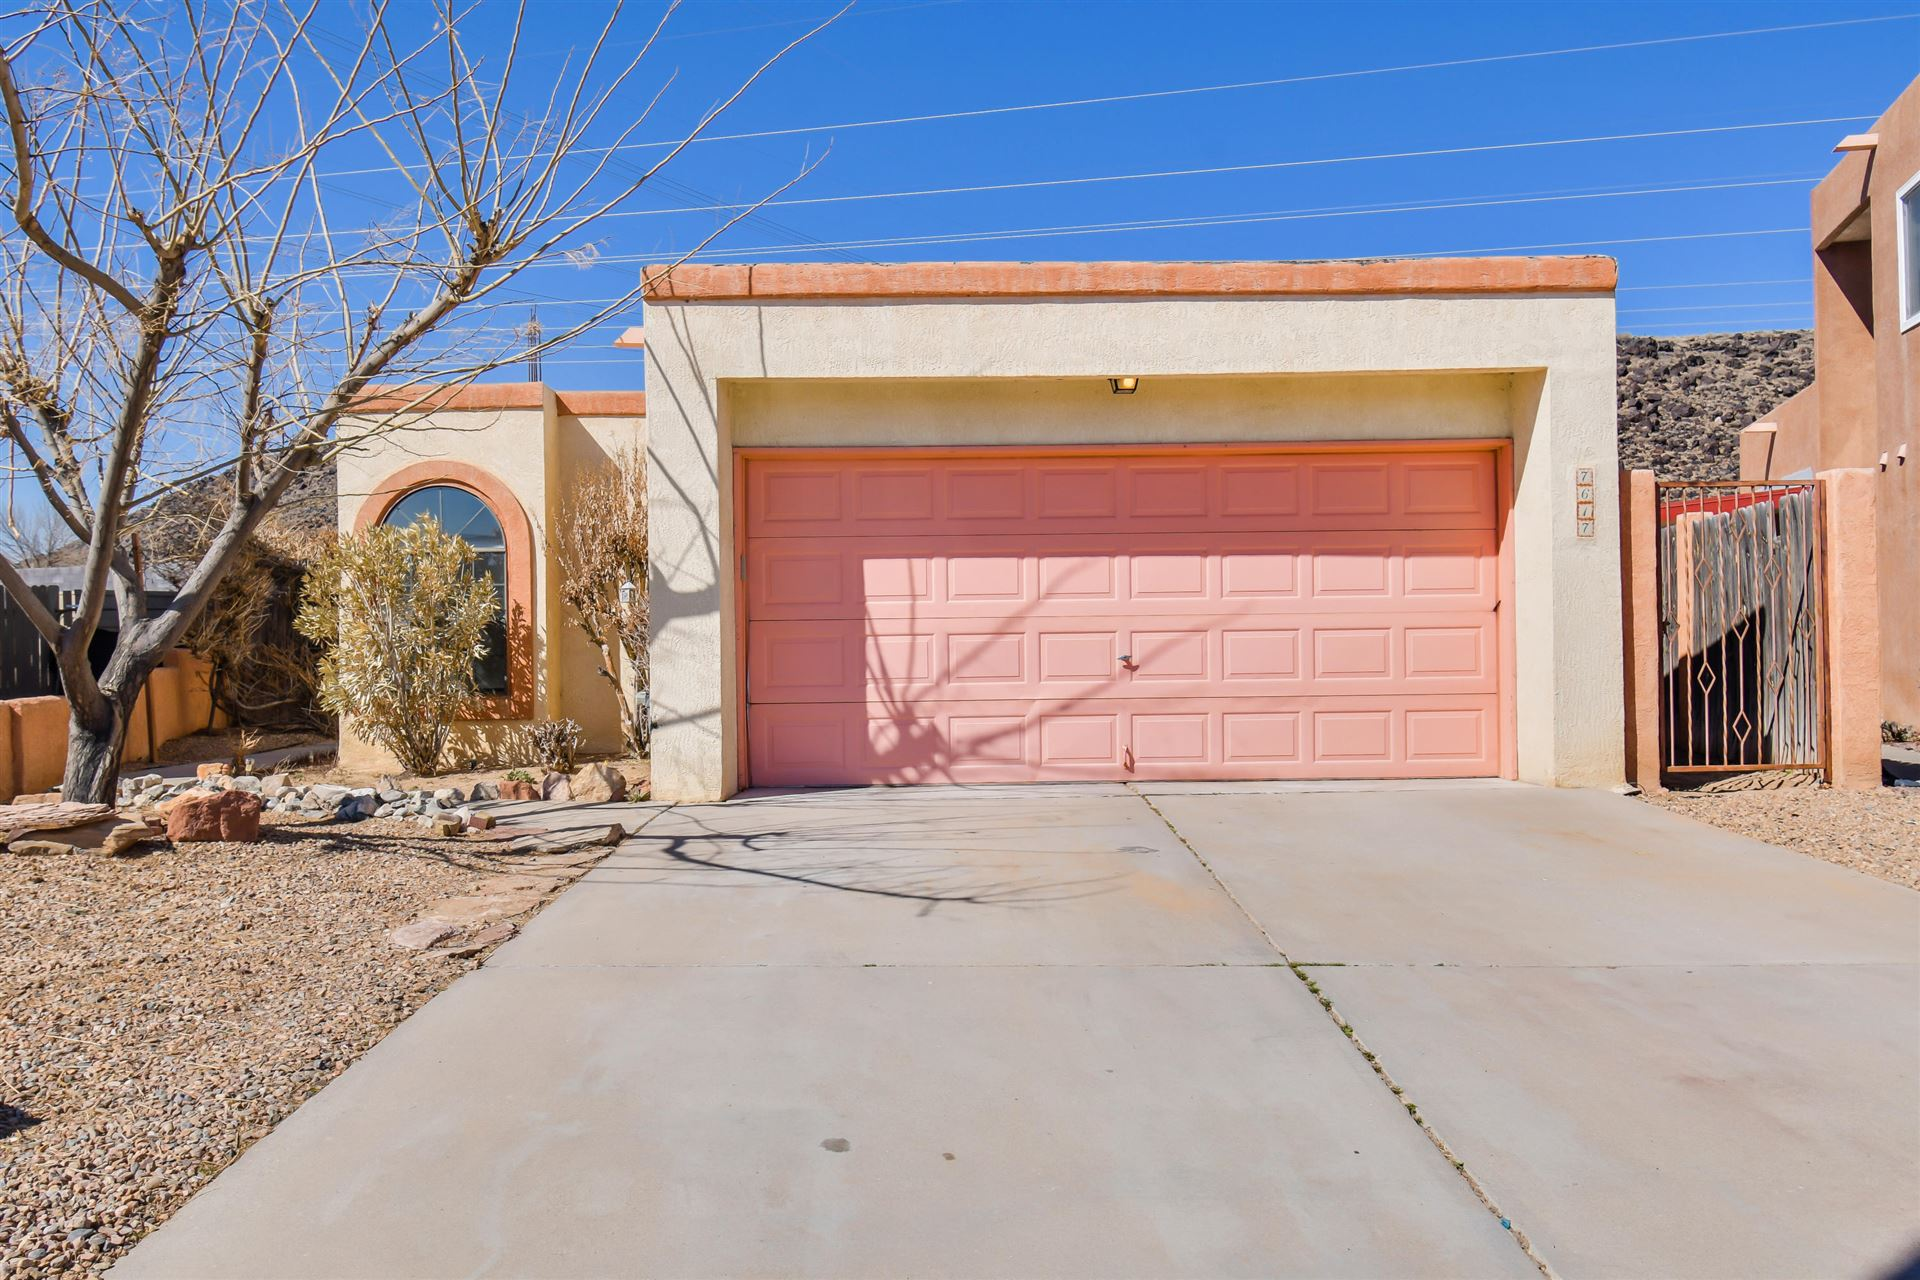 7617 CLEGHORN Court NW, Albuquerque, NM 87120 - MLS#: 986686